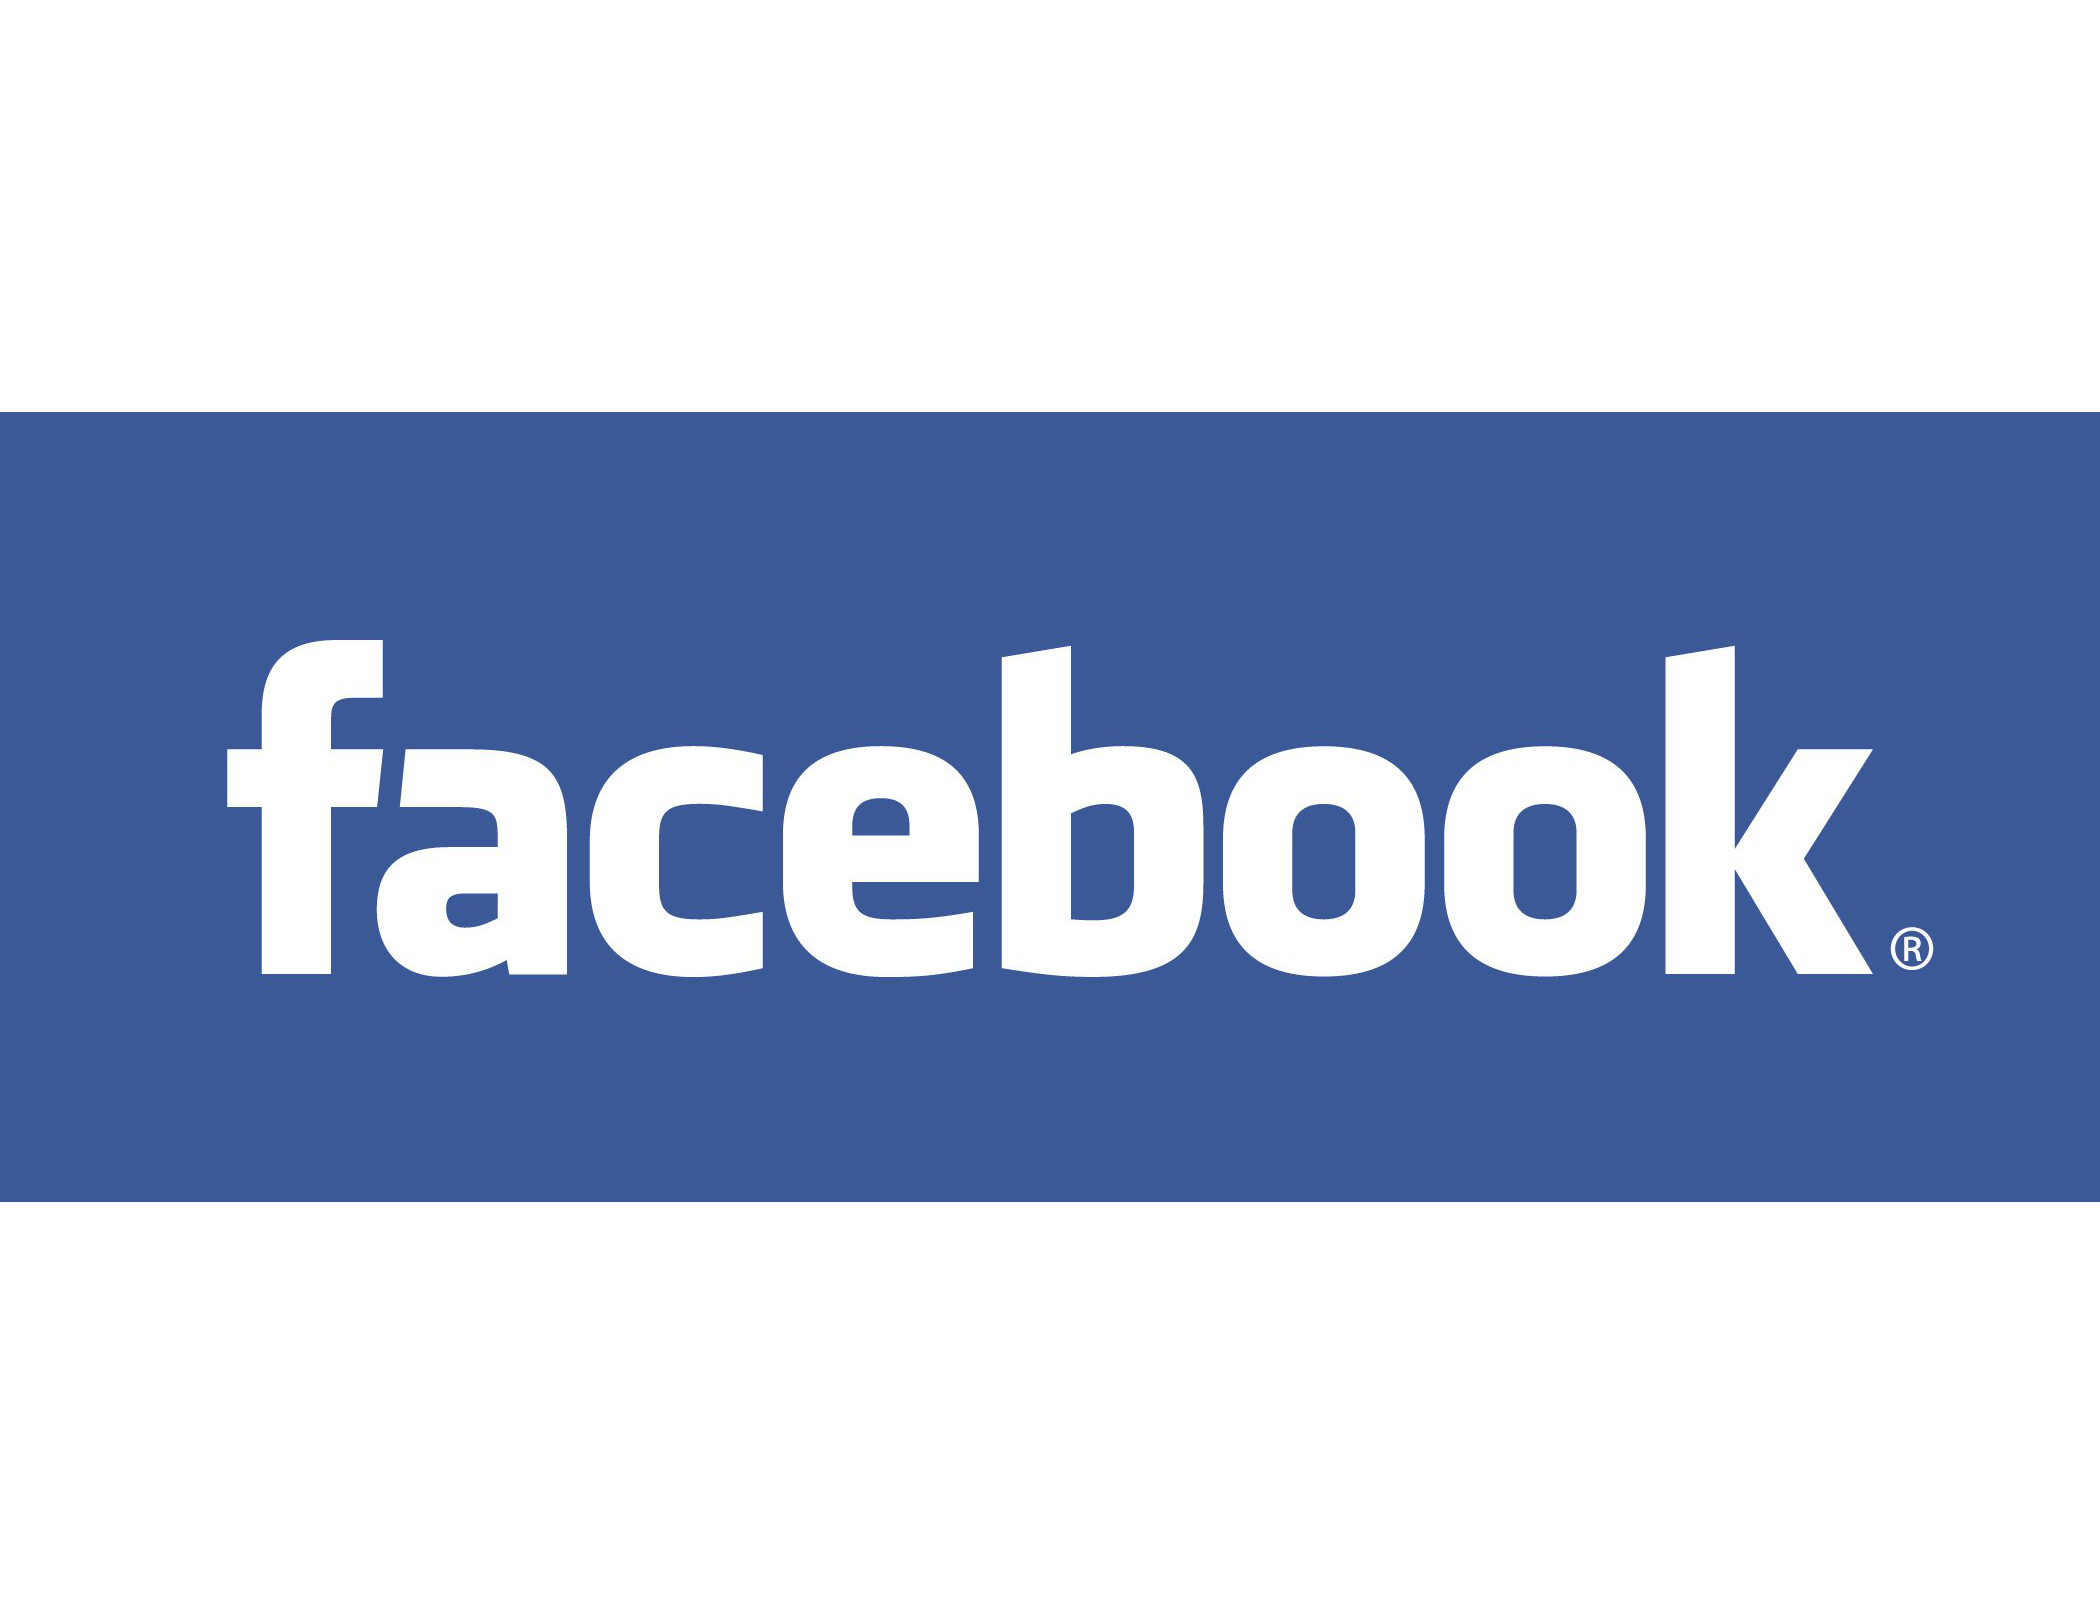 Logo transparent png pictures. Facebook clipart header